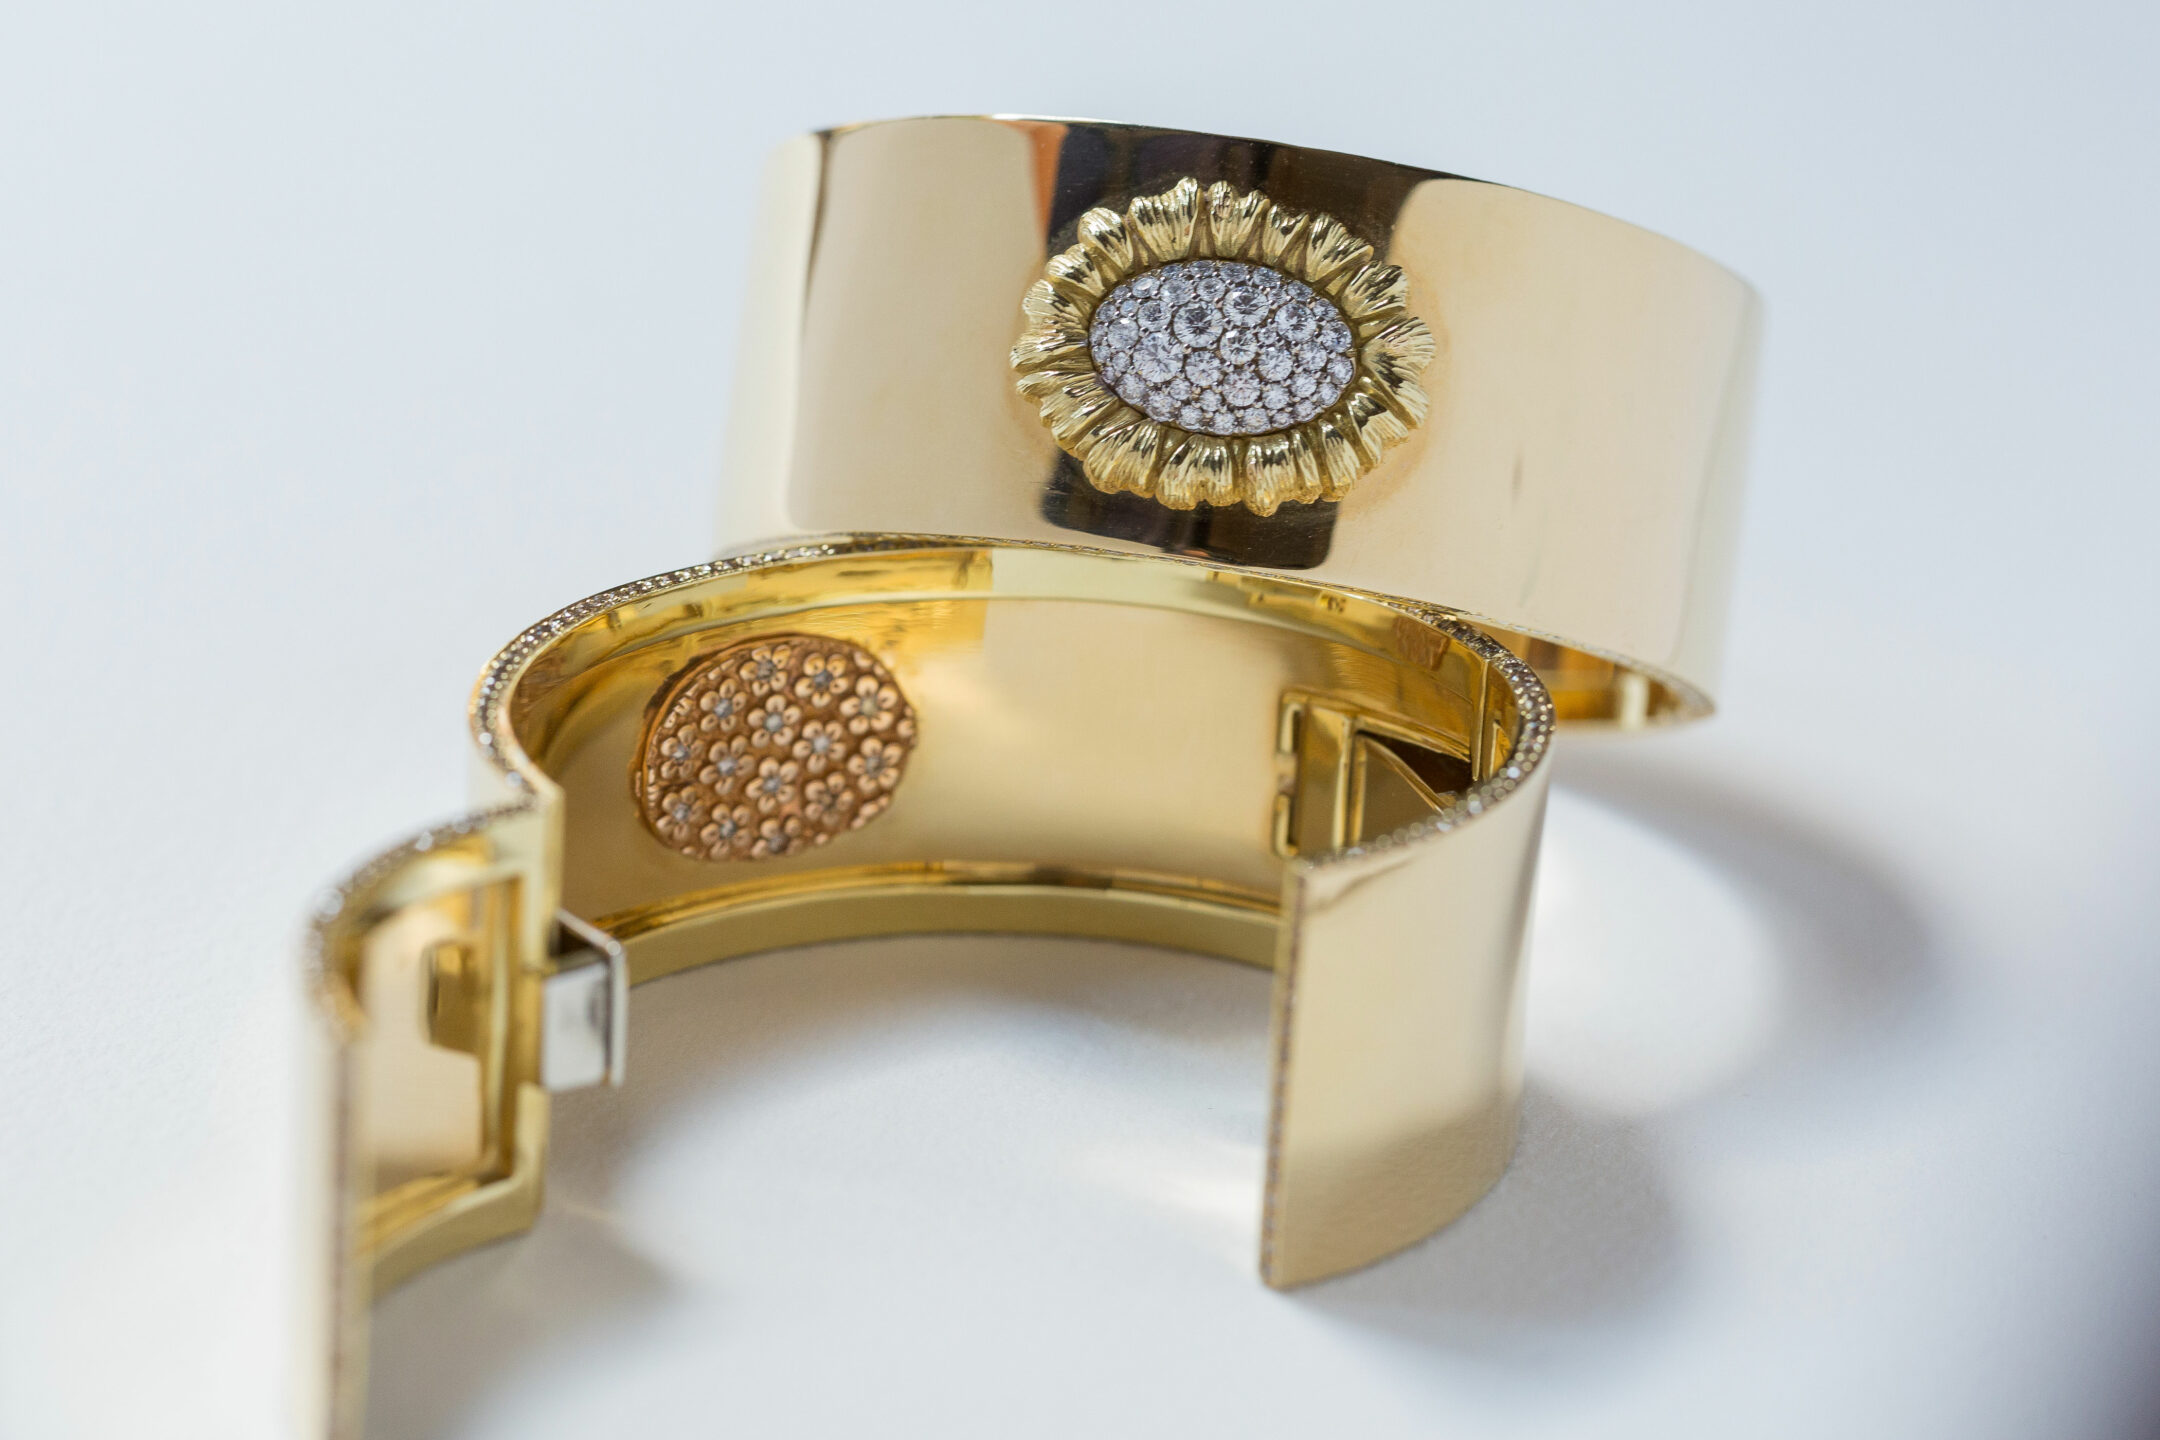 mish_jewelry_product_Nigella-YG-Cuff-6